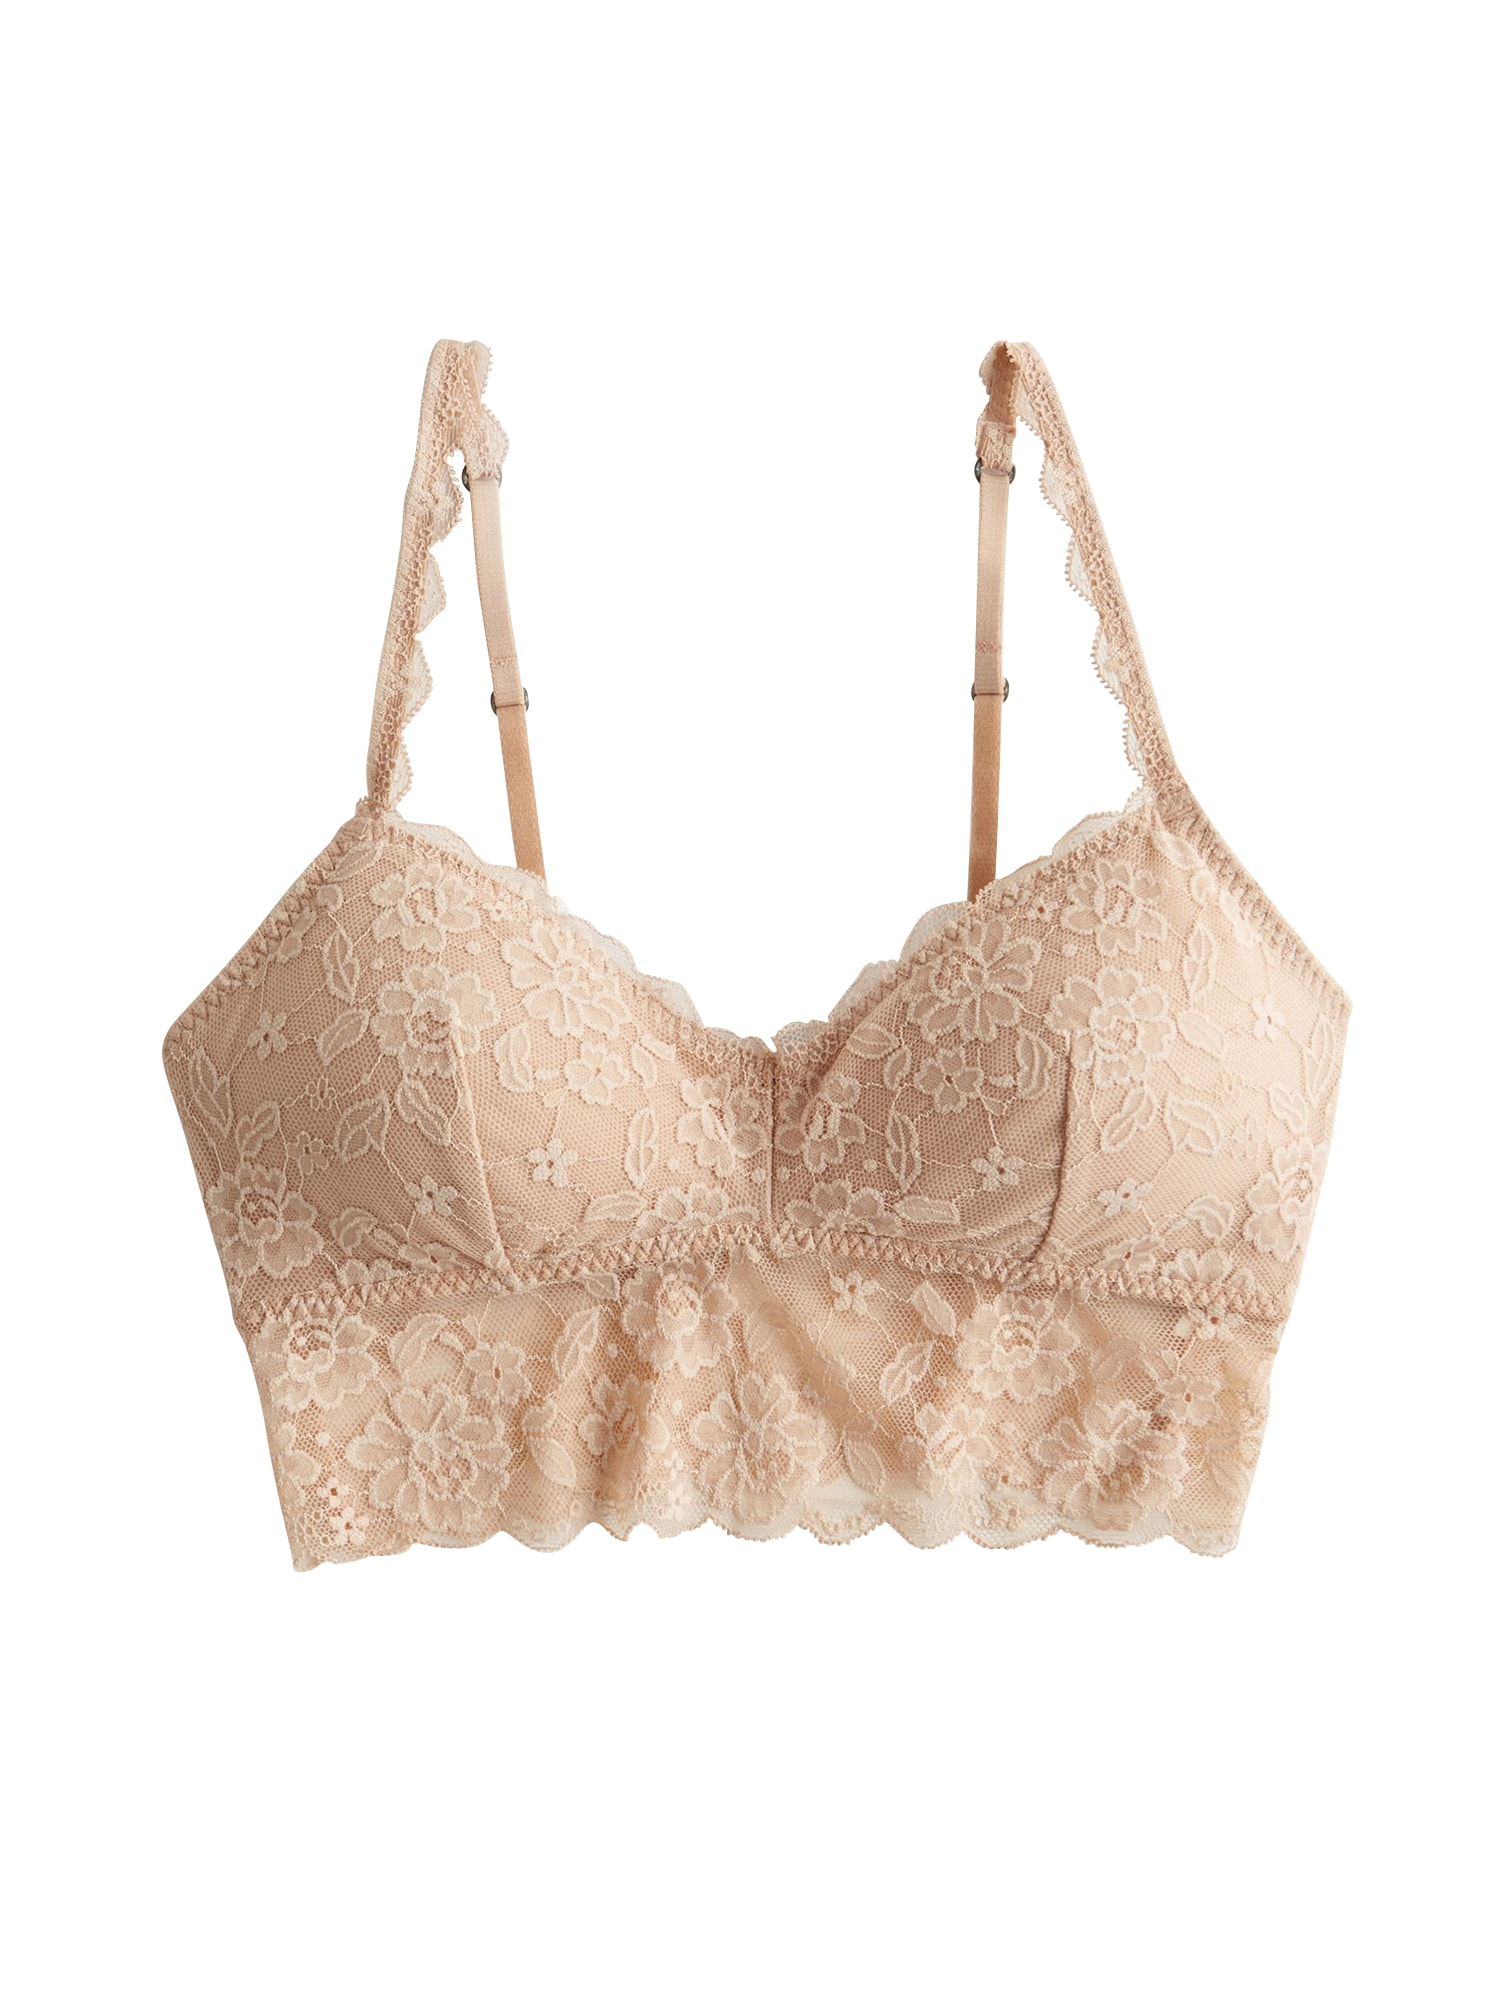 Podprsenka NEUTRAL CORE LONGLINE Bralette nude HOLLISTER